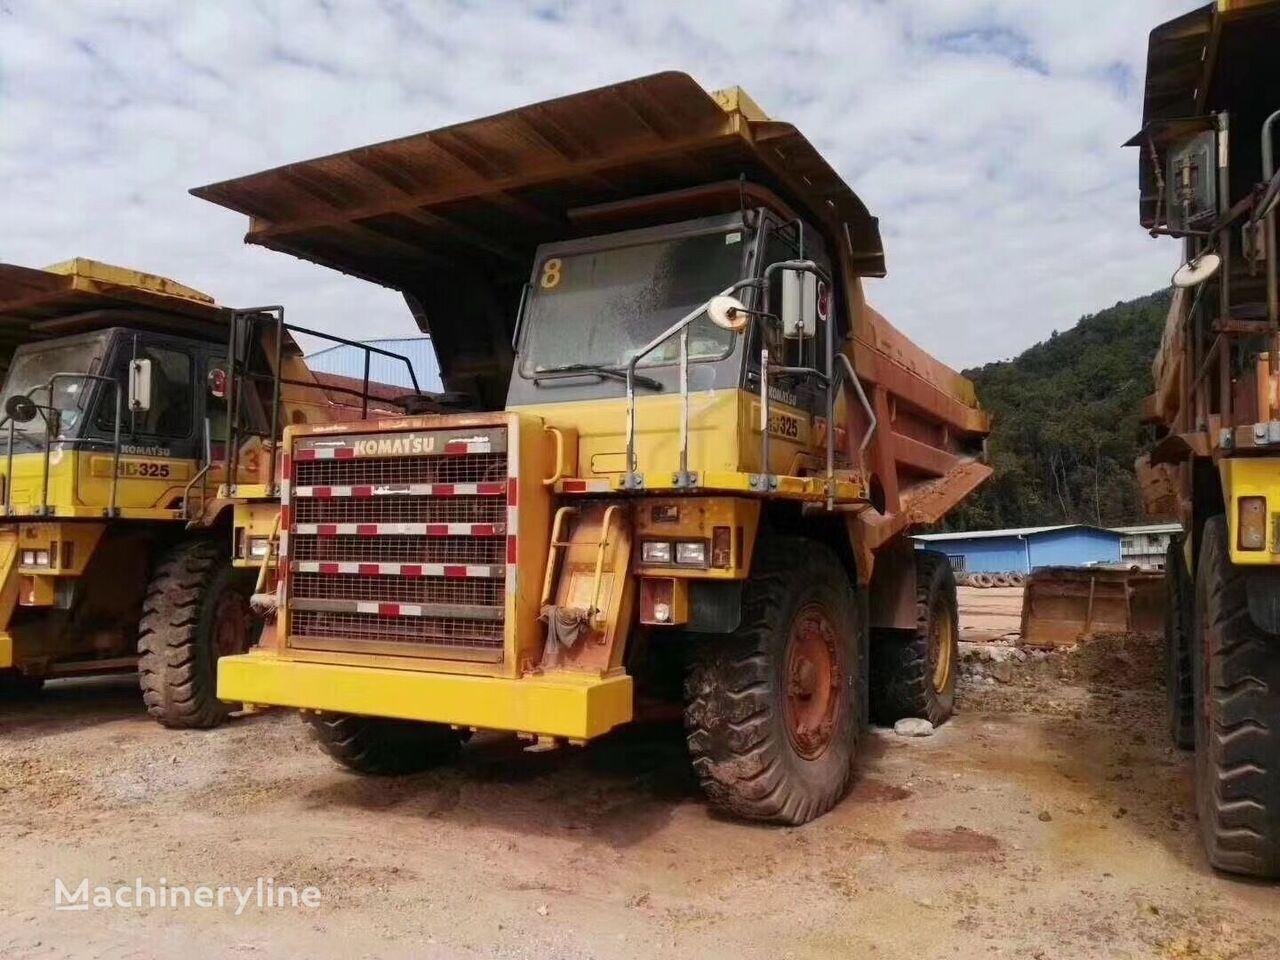 KOMATSU HD325 komatsu truck mining haul truck